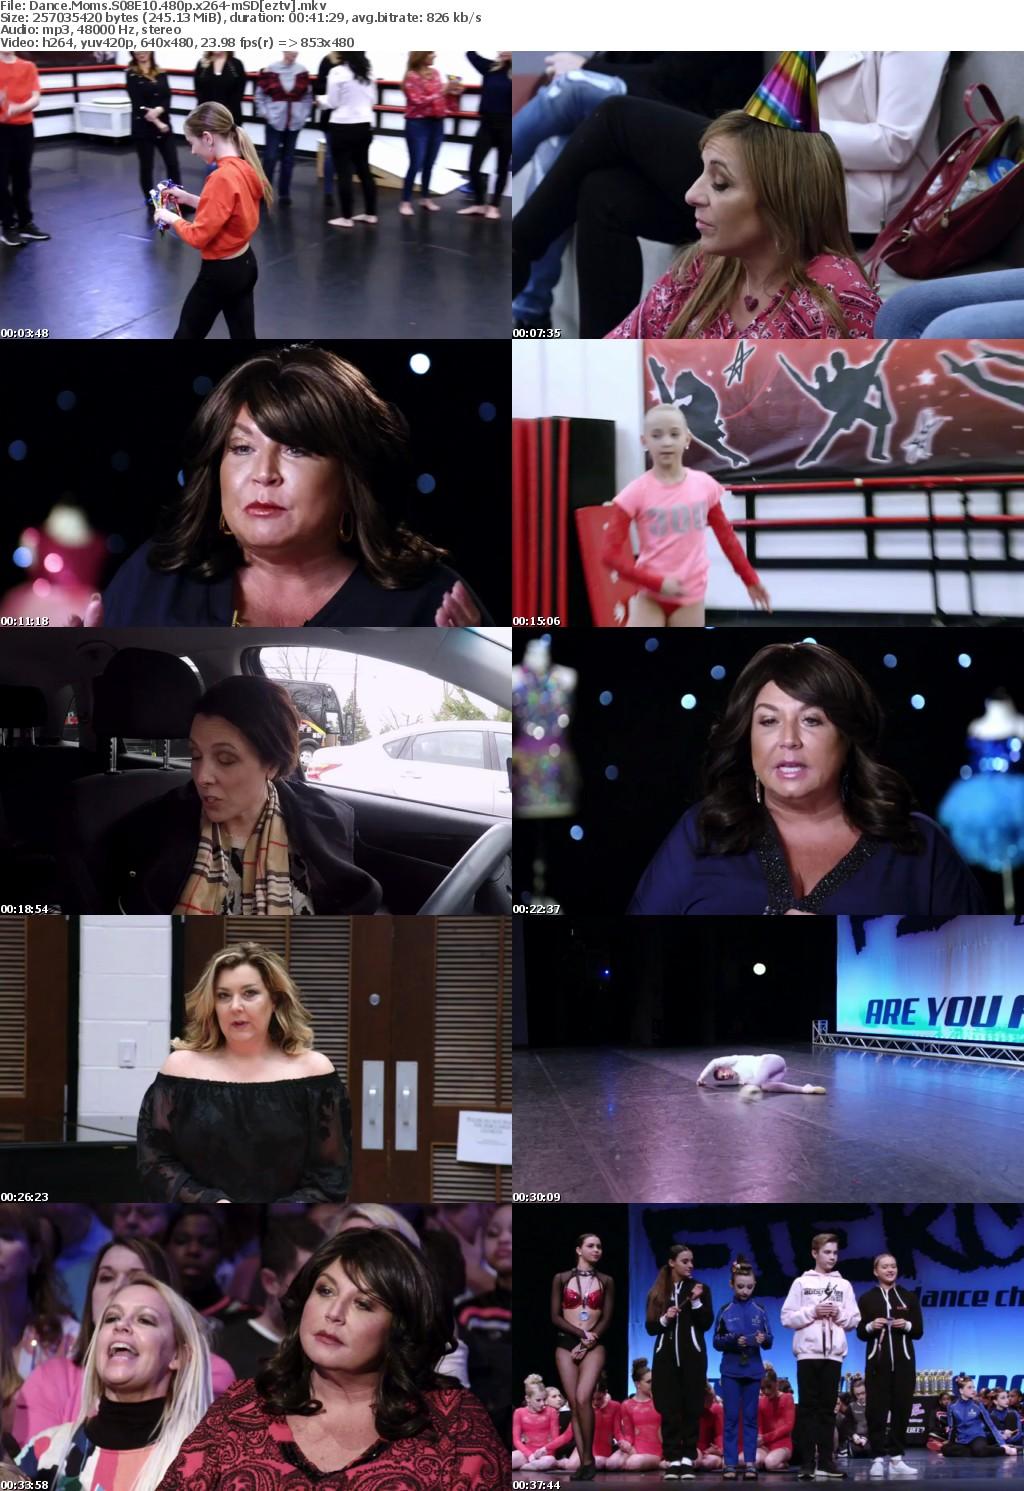 Dance Moms S08E10 480p x264 mSD